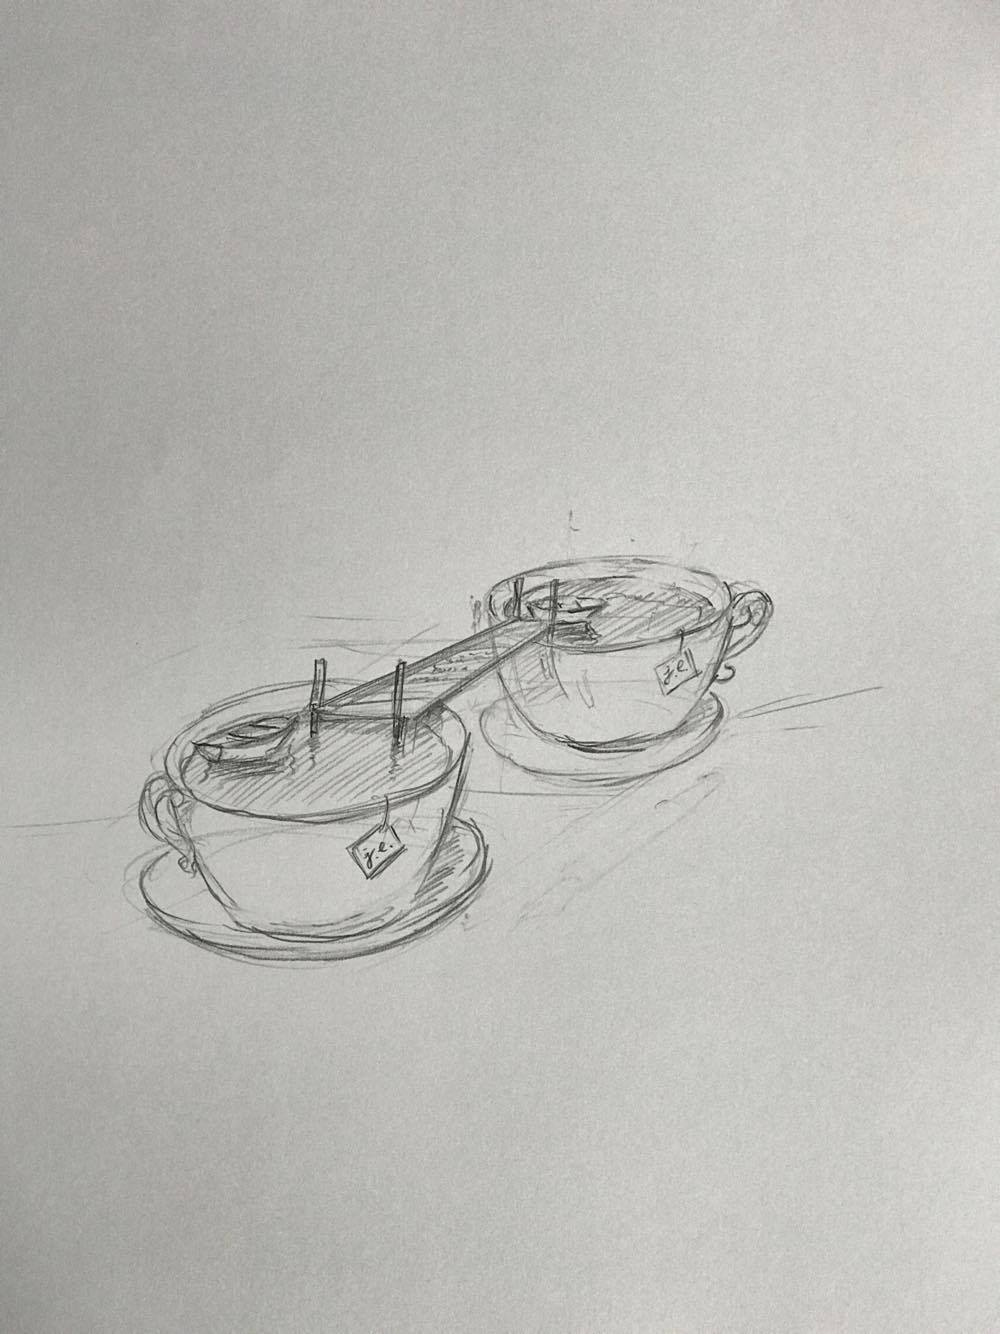 eric lin sketch.jpg